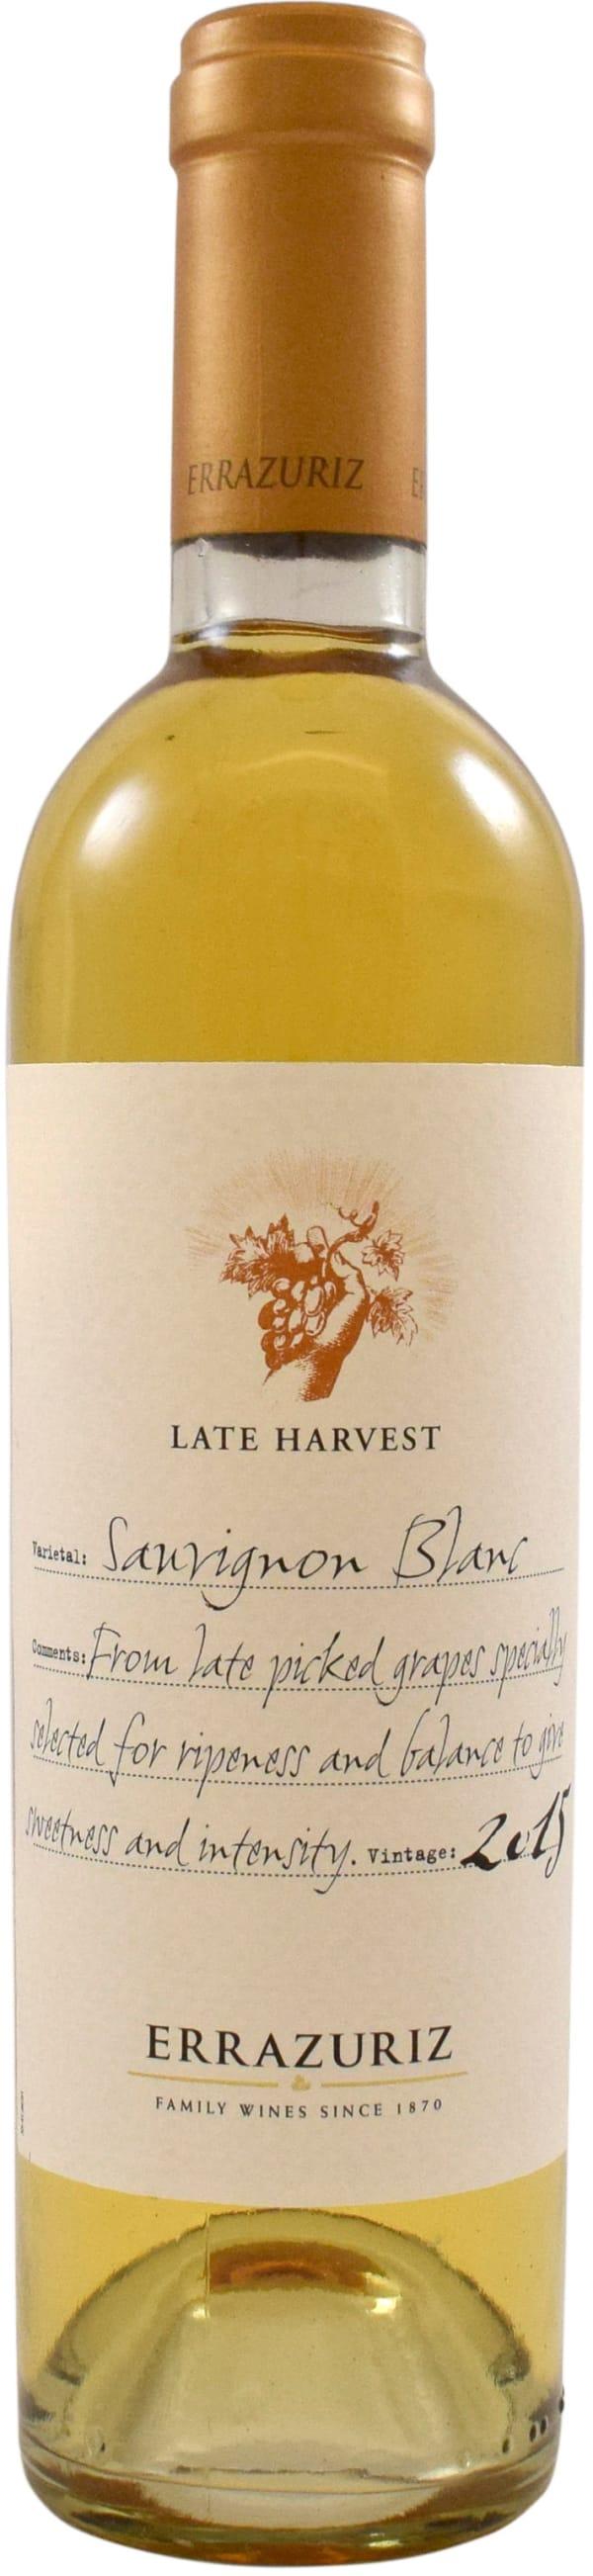 Errazuriz Late Harvest Sauvignon Blanc 2015